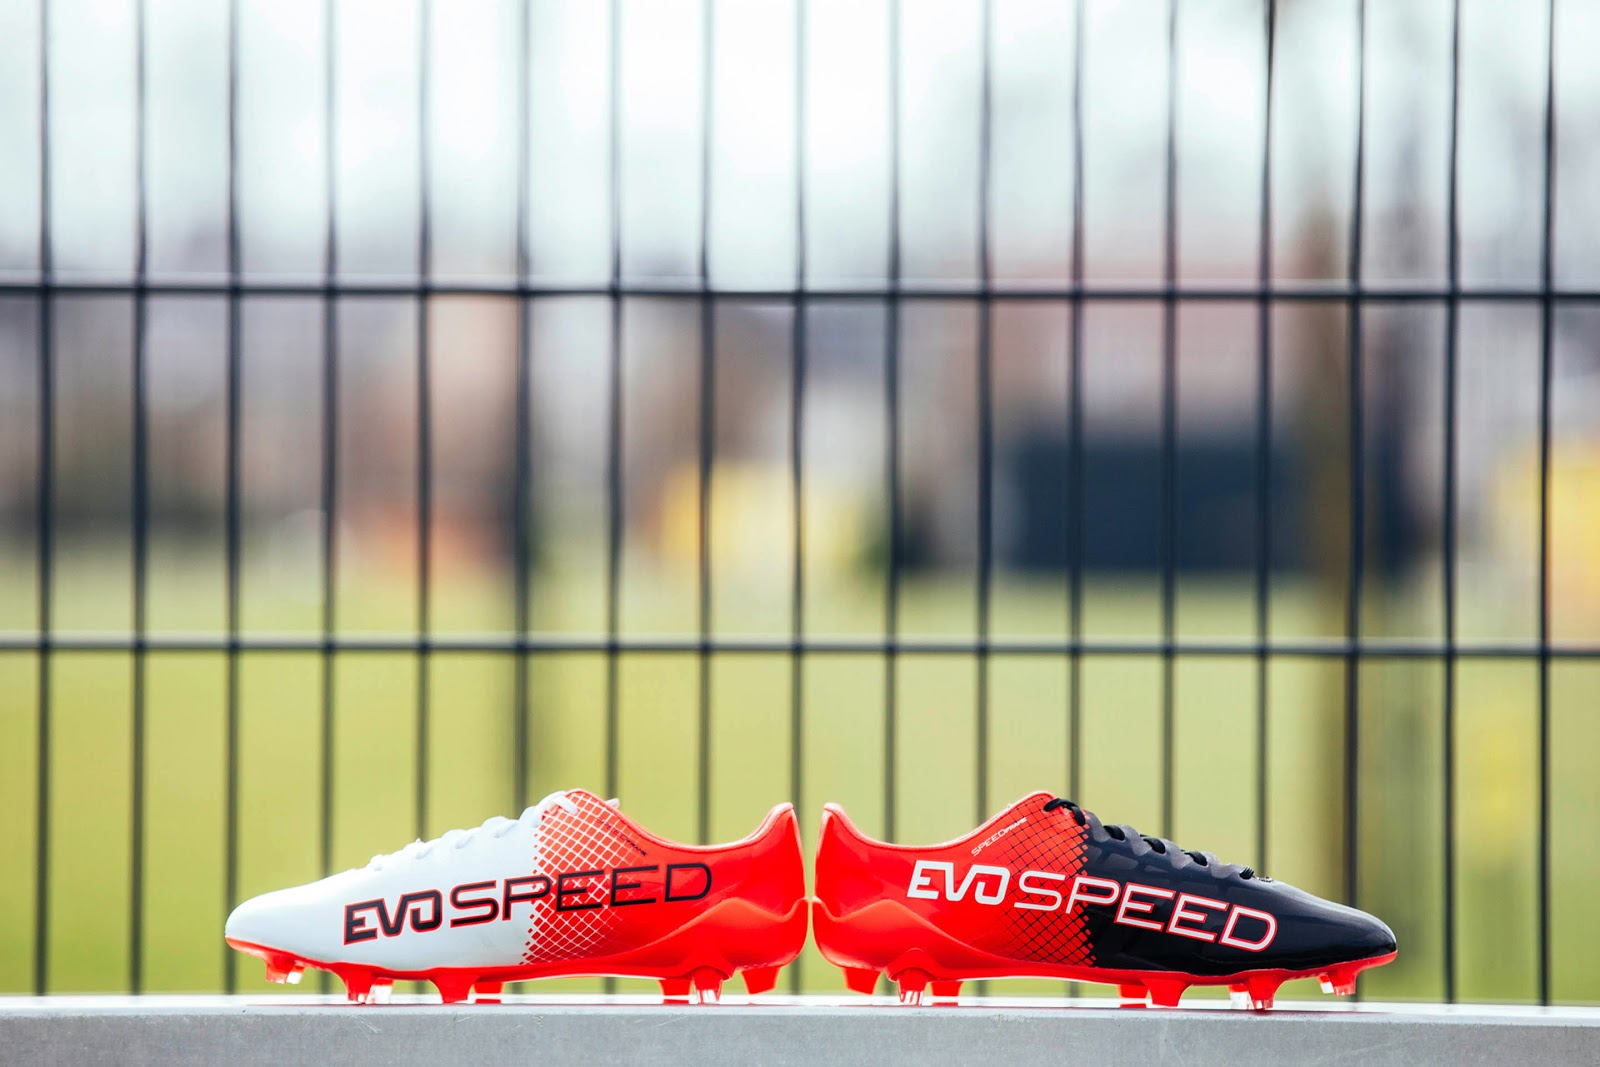 separation shoes b6ac6 29ee8 Yükle (1600x1067)Two-Colored Red   Black Puma evoSPEED 2016-2017 Boots  Released - Footy HeadlinesPuma evoSPEED SL-S II Red Blast   Black   White.